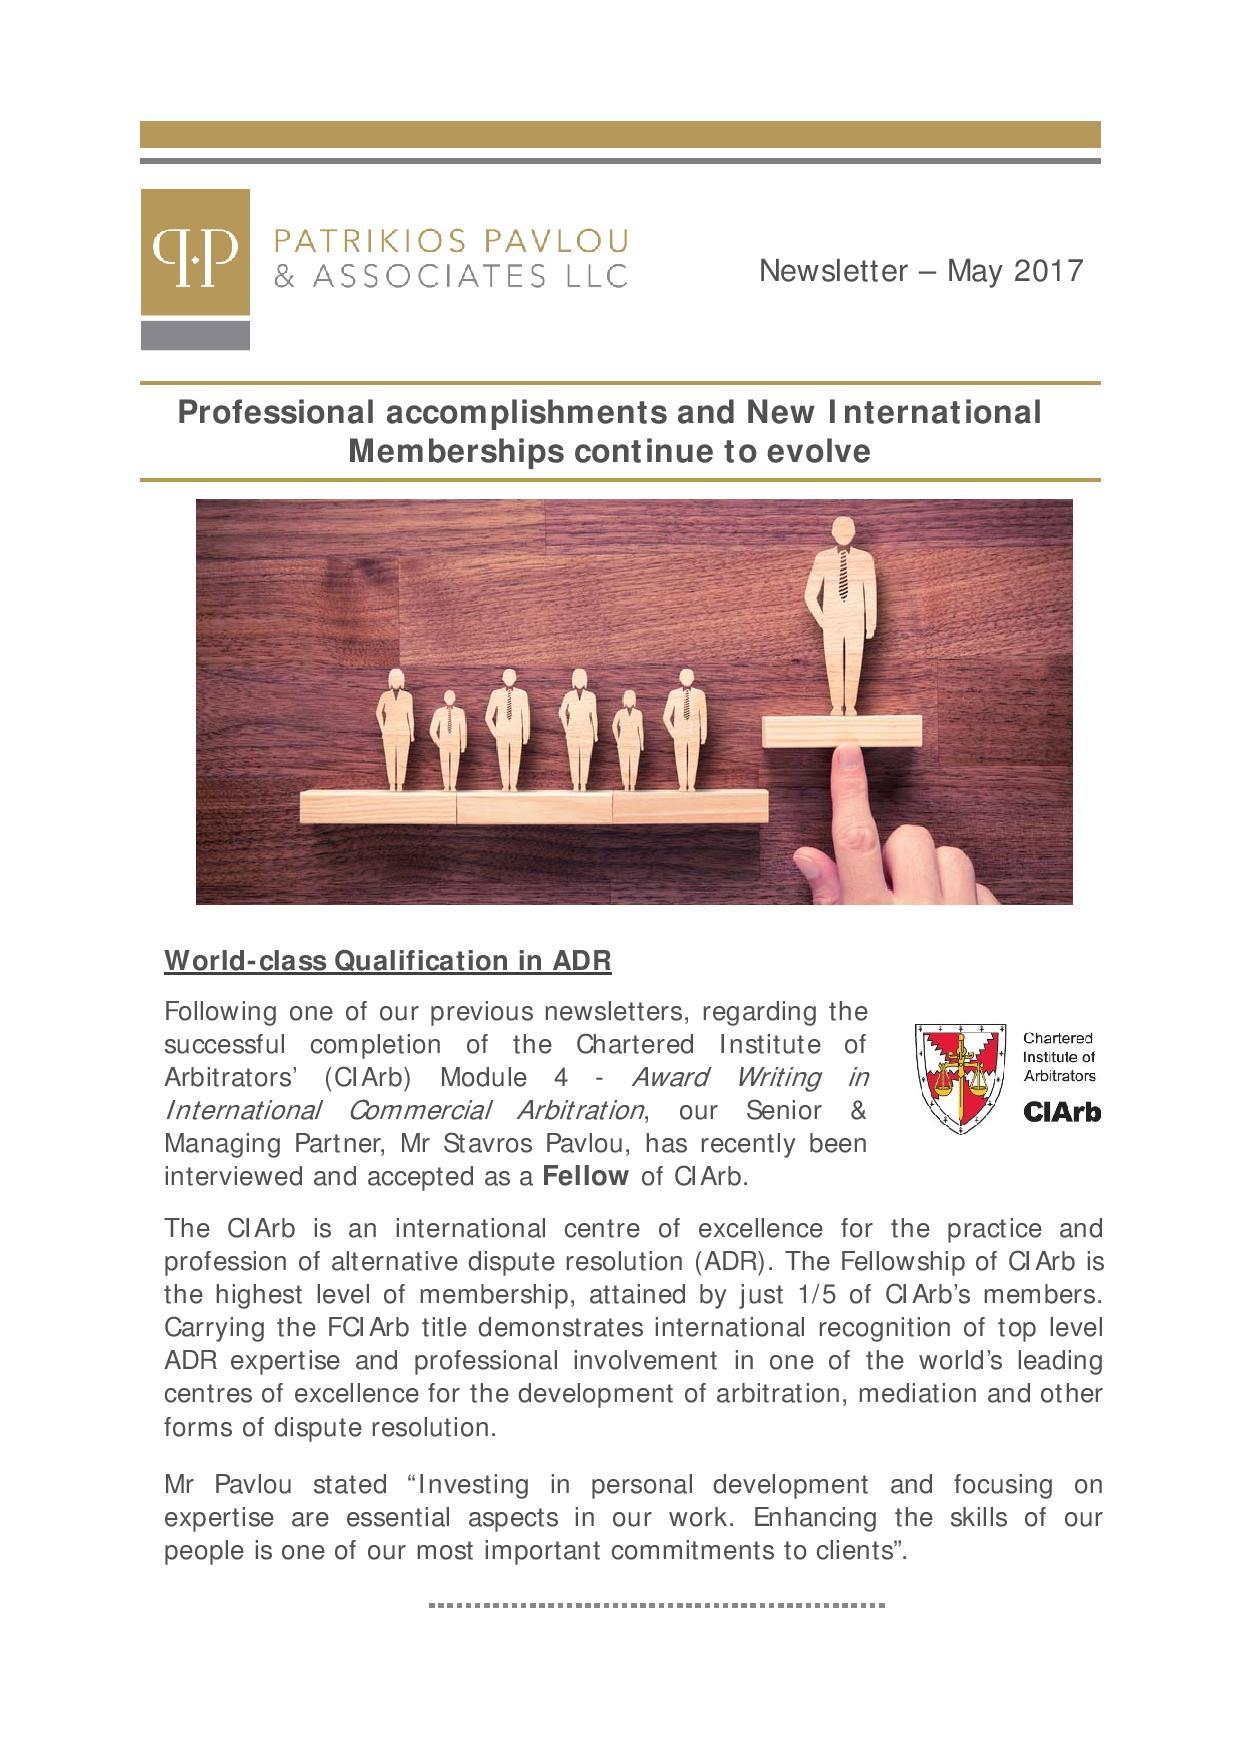 Patrikios Pavlou & Associates LLC:  May 2017 Newsletter